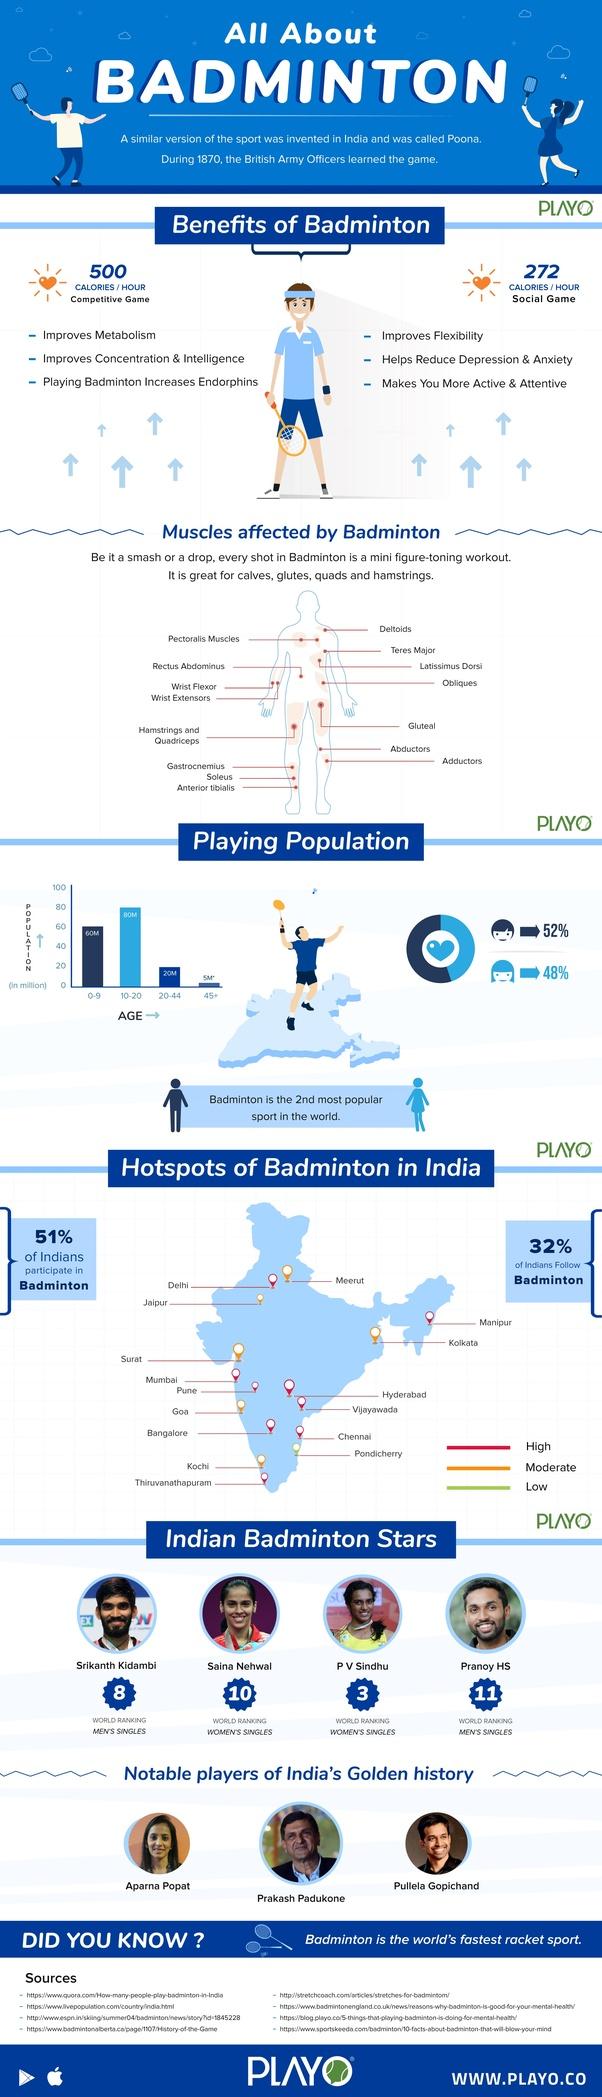 Who Invented Badminton Quora